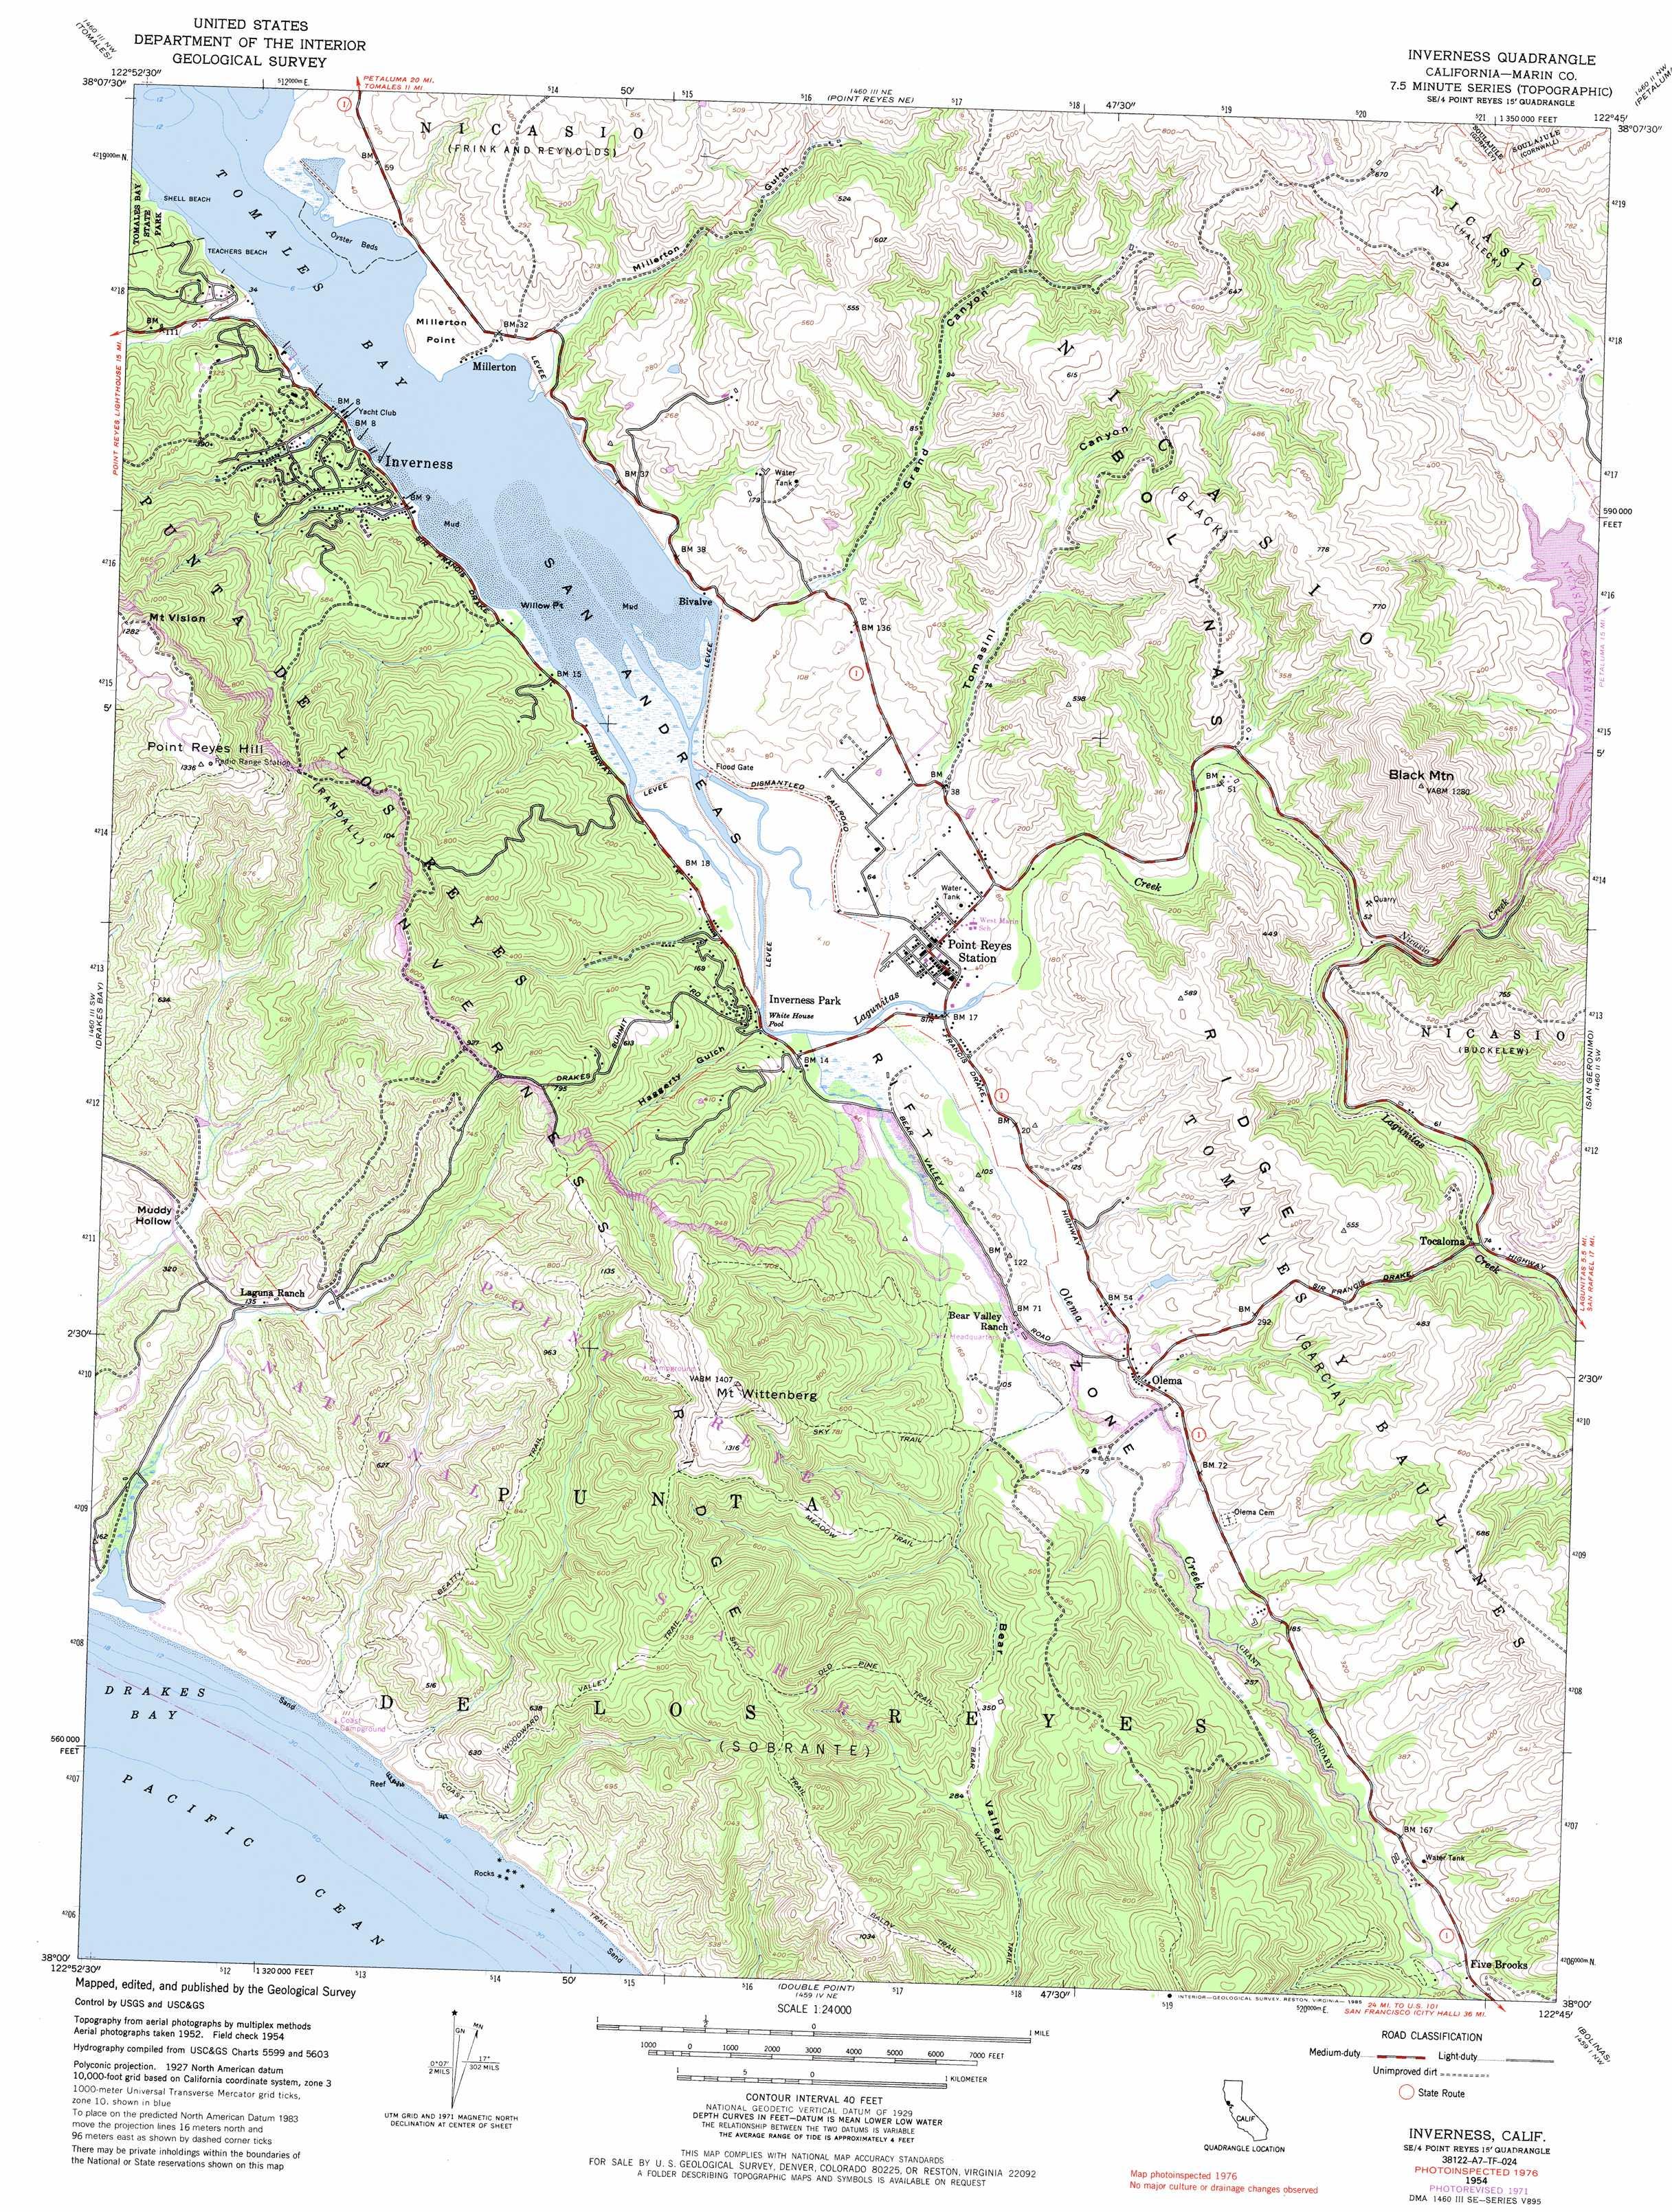 Inverness Topographic Map CA USGS Topo Quad A - Florida map inverness